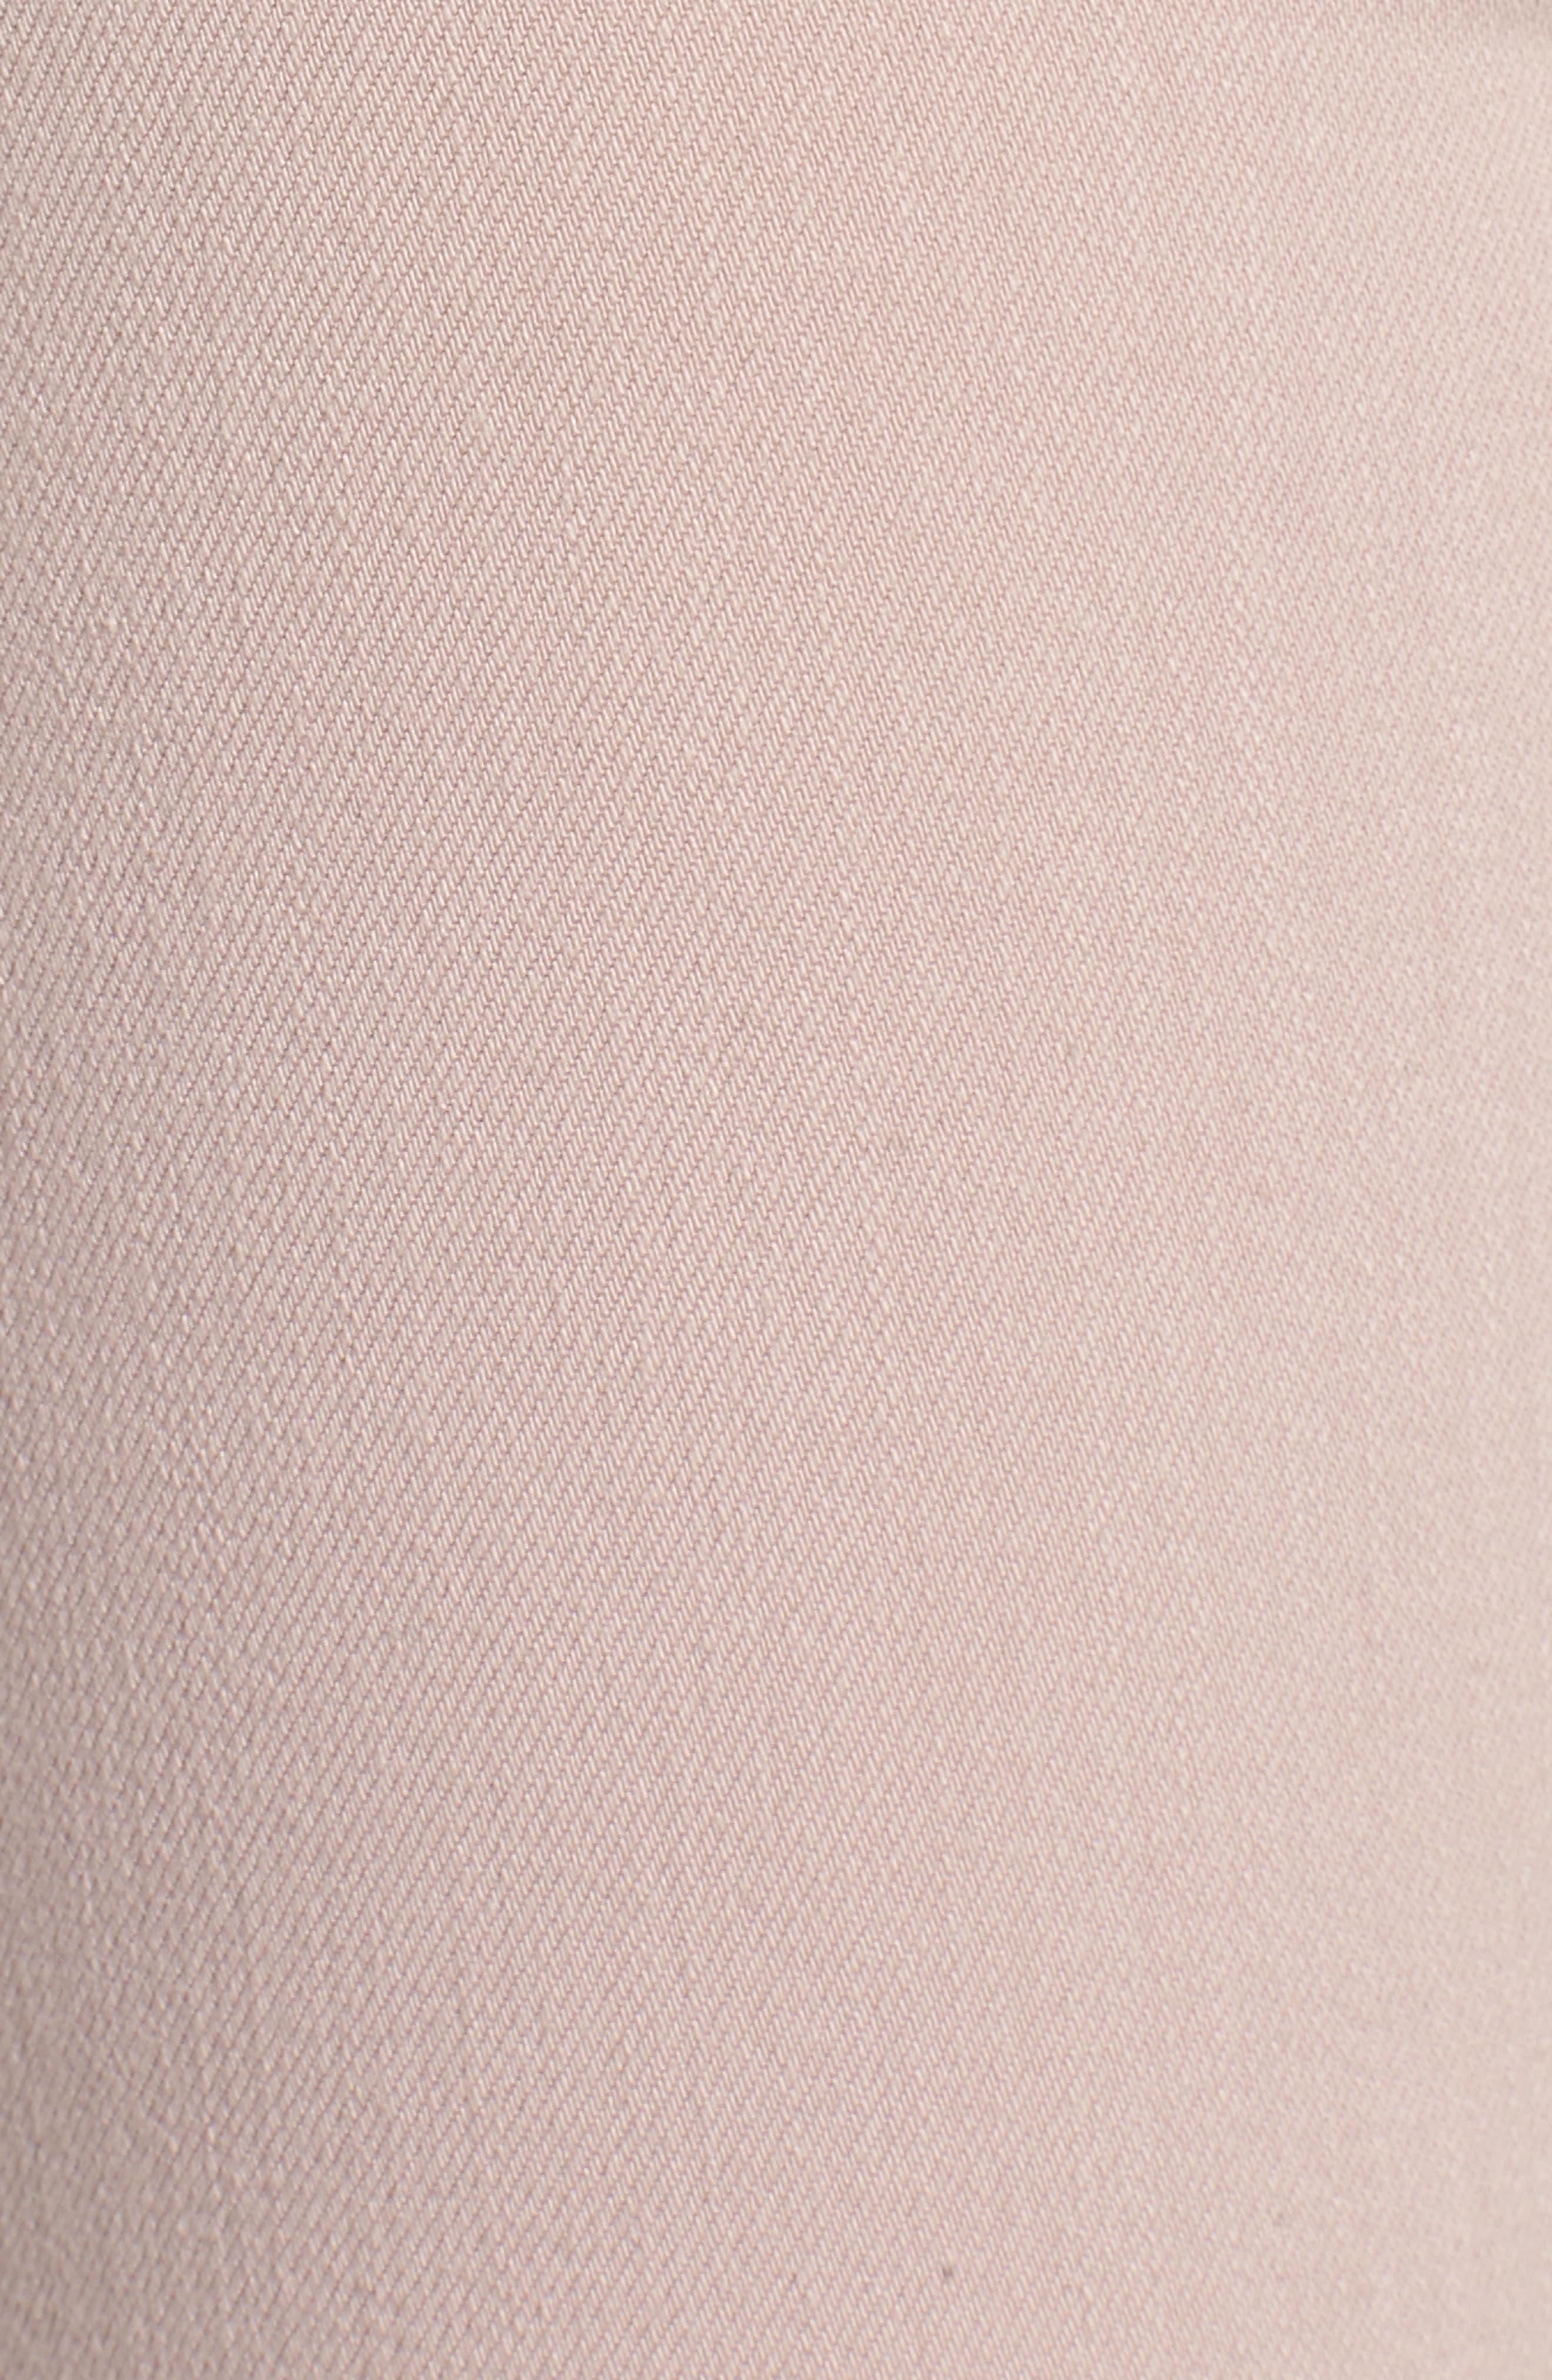 Barbara High Waist Raw Hem Ankle Skinny Jeans,                             Alternate thumbnail 6, color,                             Blushing